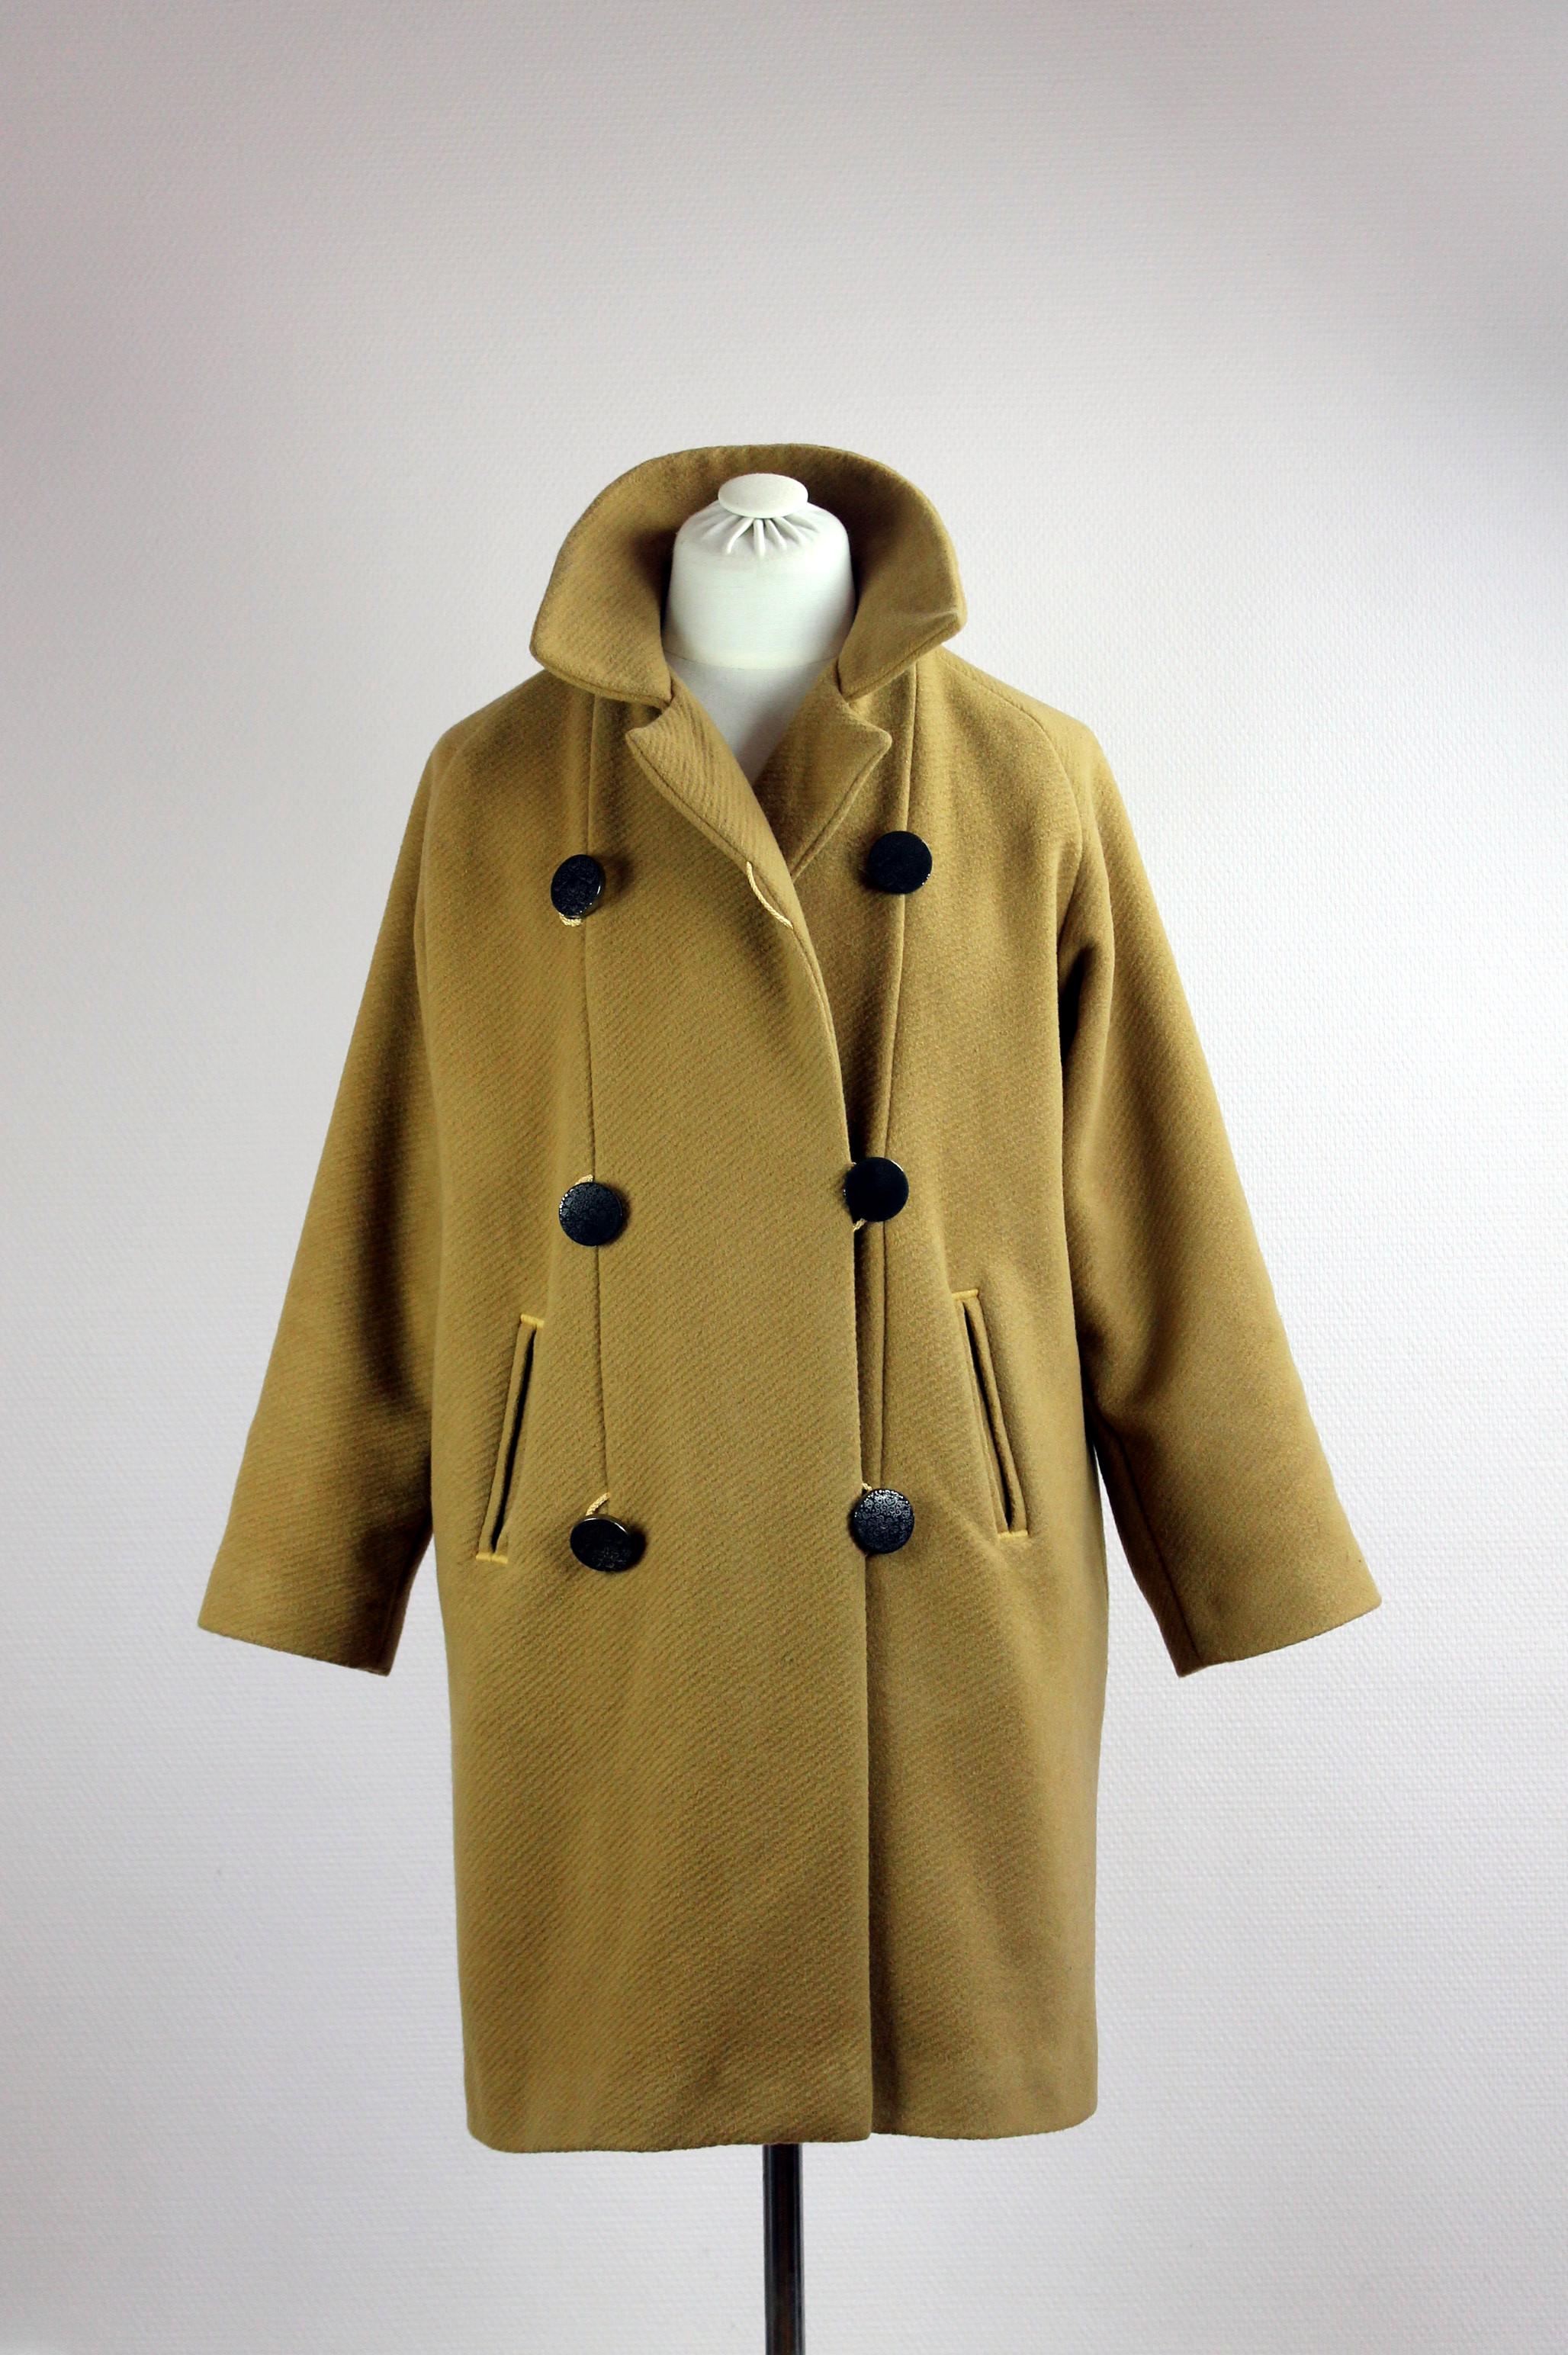 manteau vintage le retour damngoodcaramel. Black Bedroom Furniture Sets. Home Design Ideas